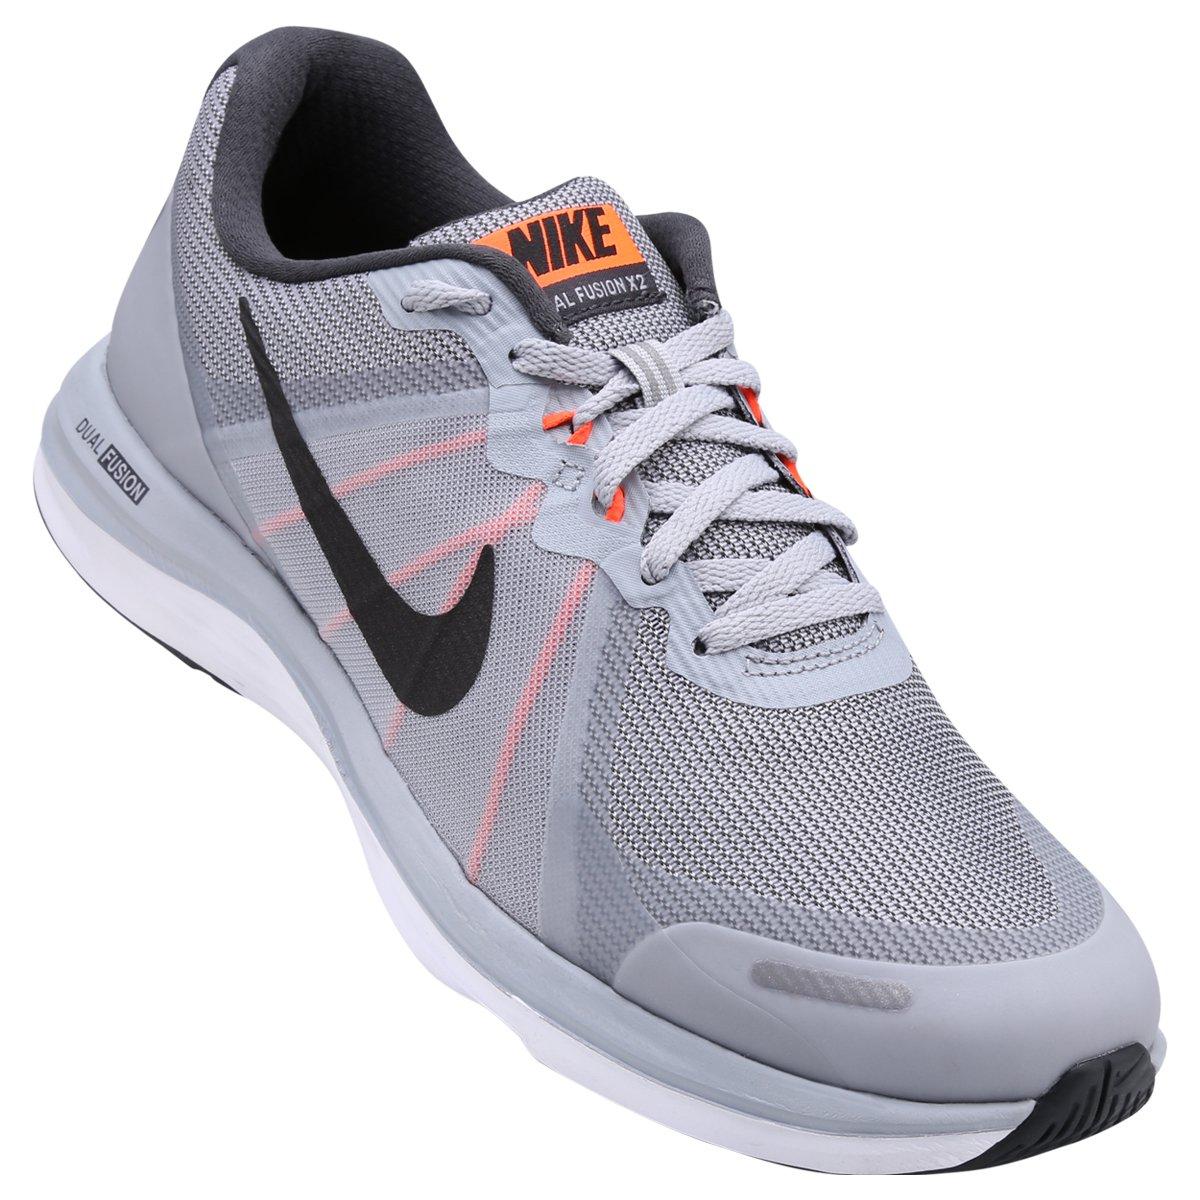 cace04dd4bd Tênis Nike Dual Fusion X 2 Masculino - Compre Agora